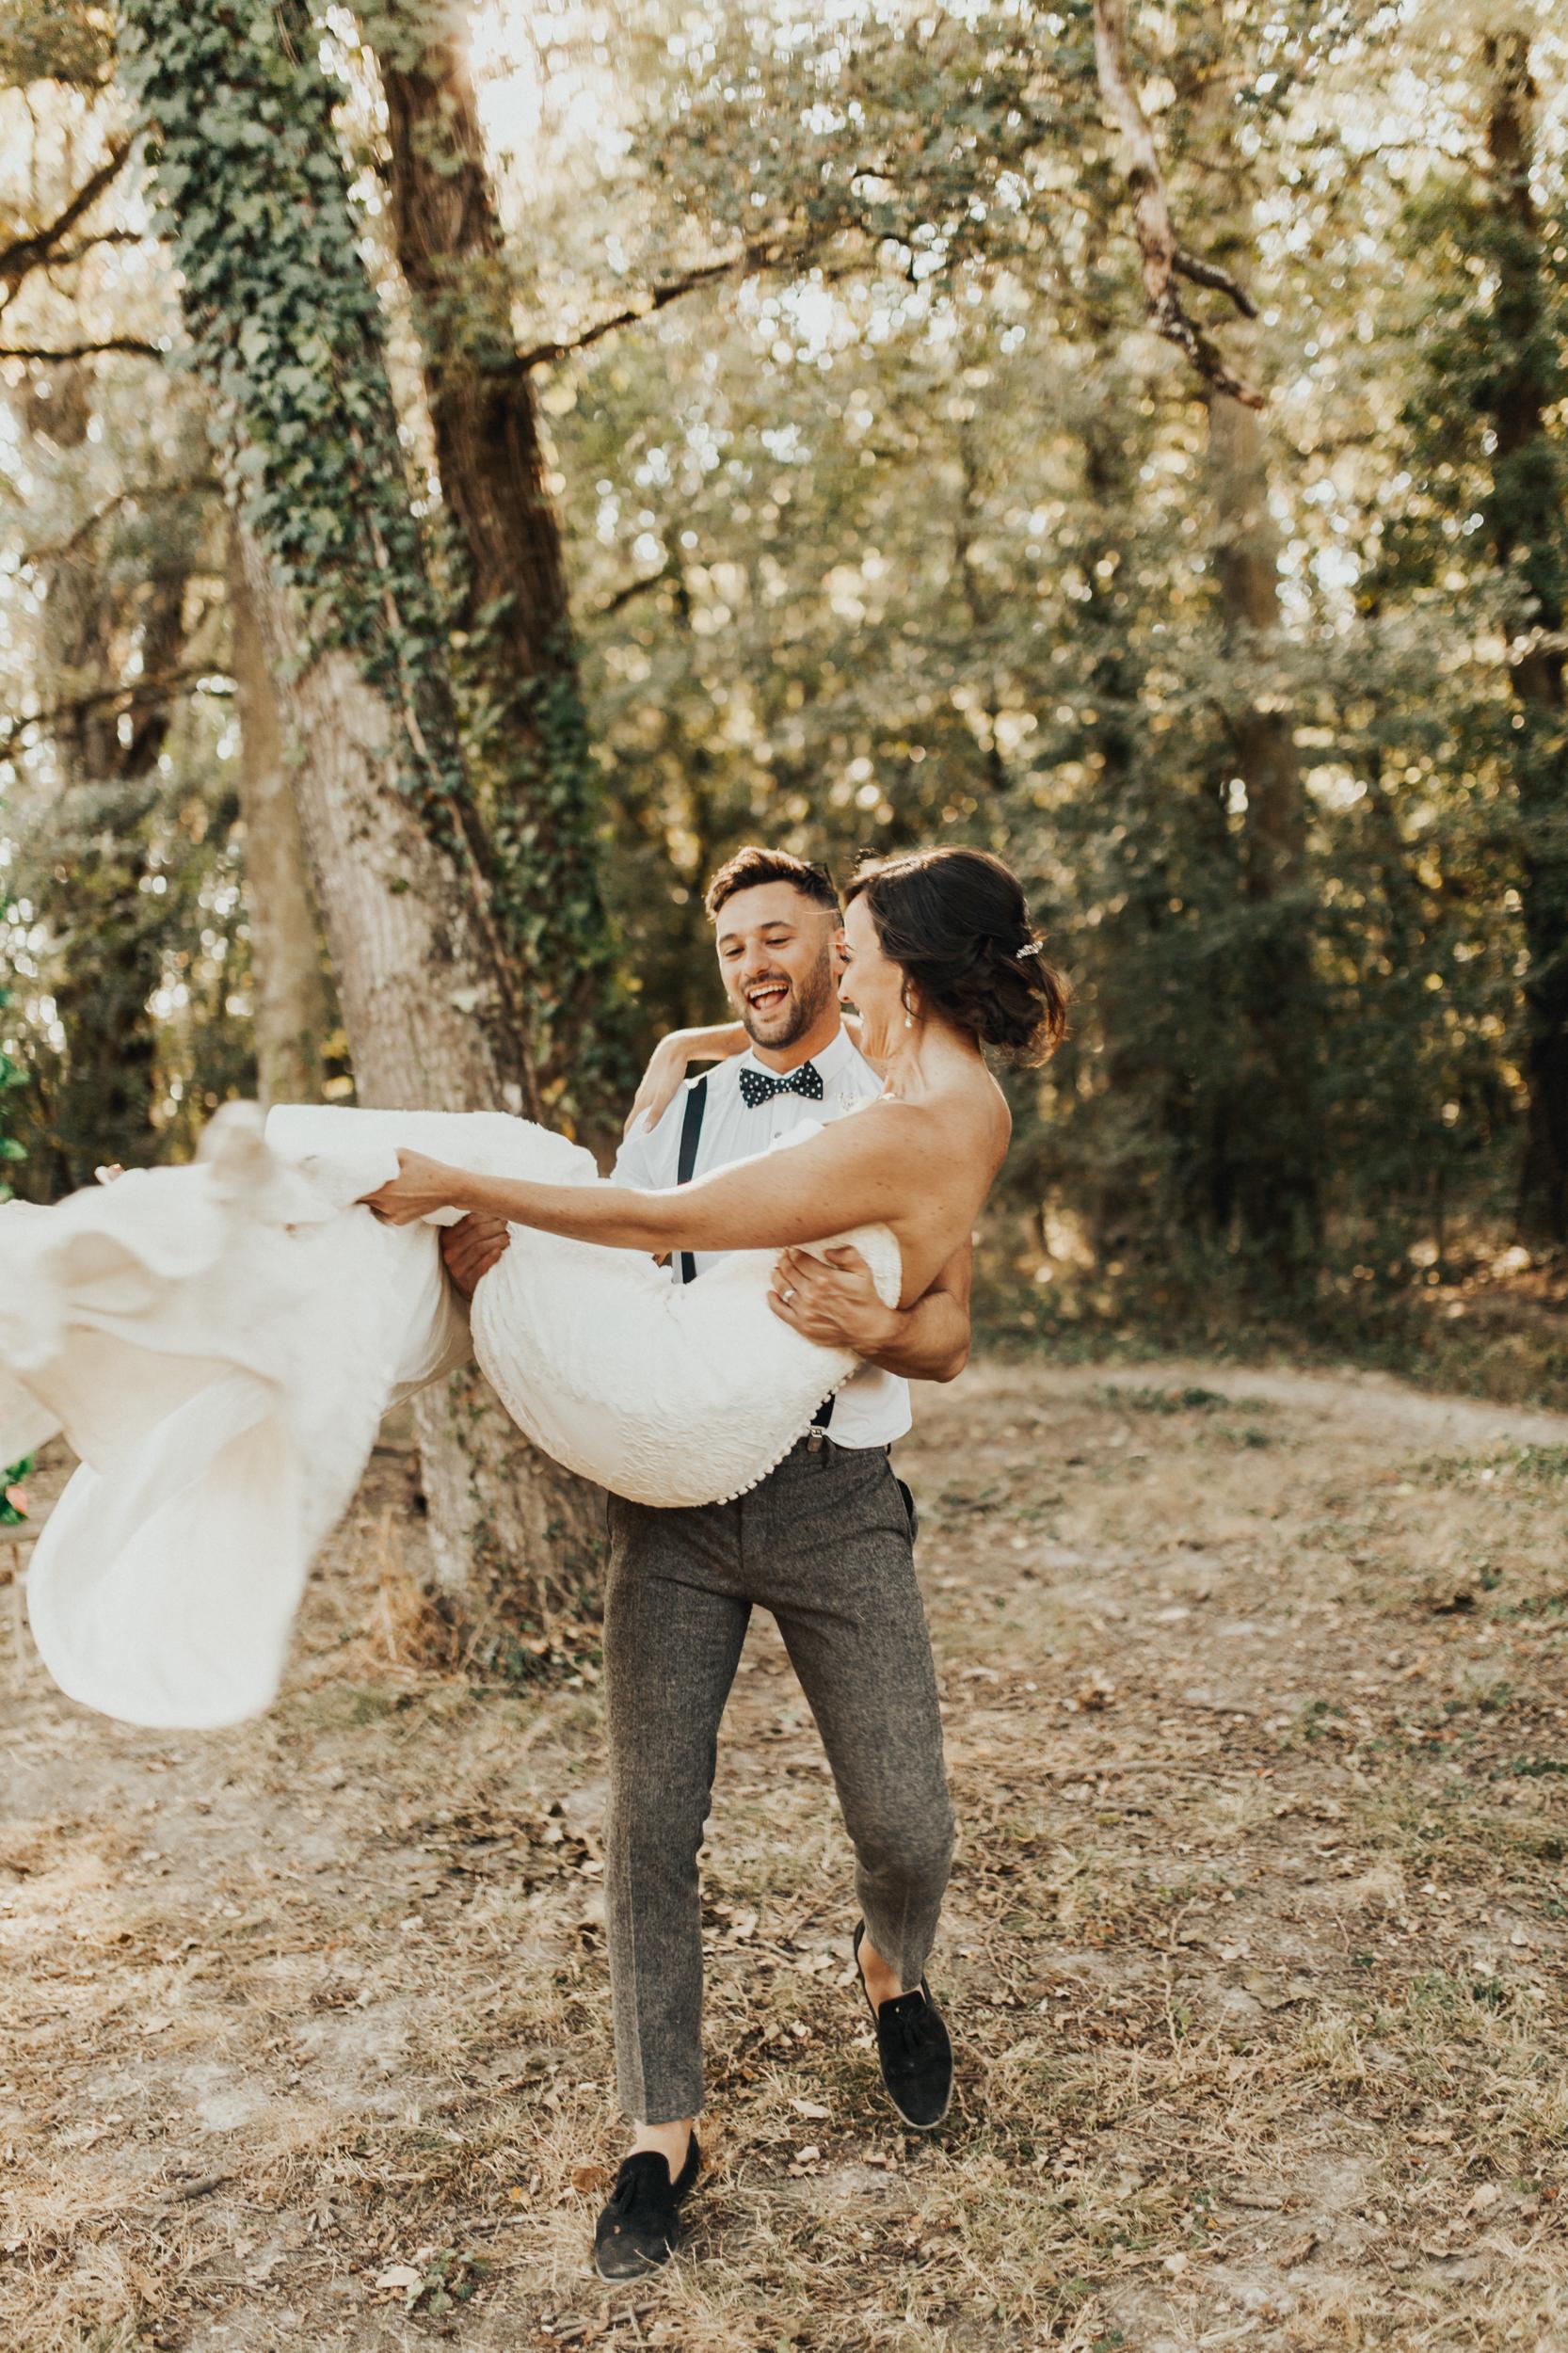 Amy-Zac-Destination-Wedding-France-Manoir-Foulquetiere-Darina-Stoda-Photography-65.jpg